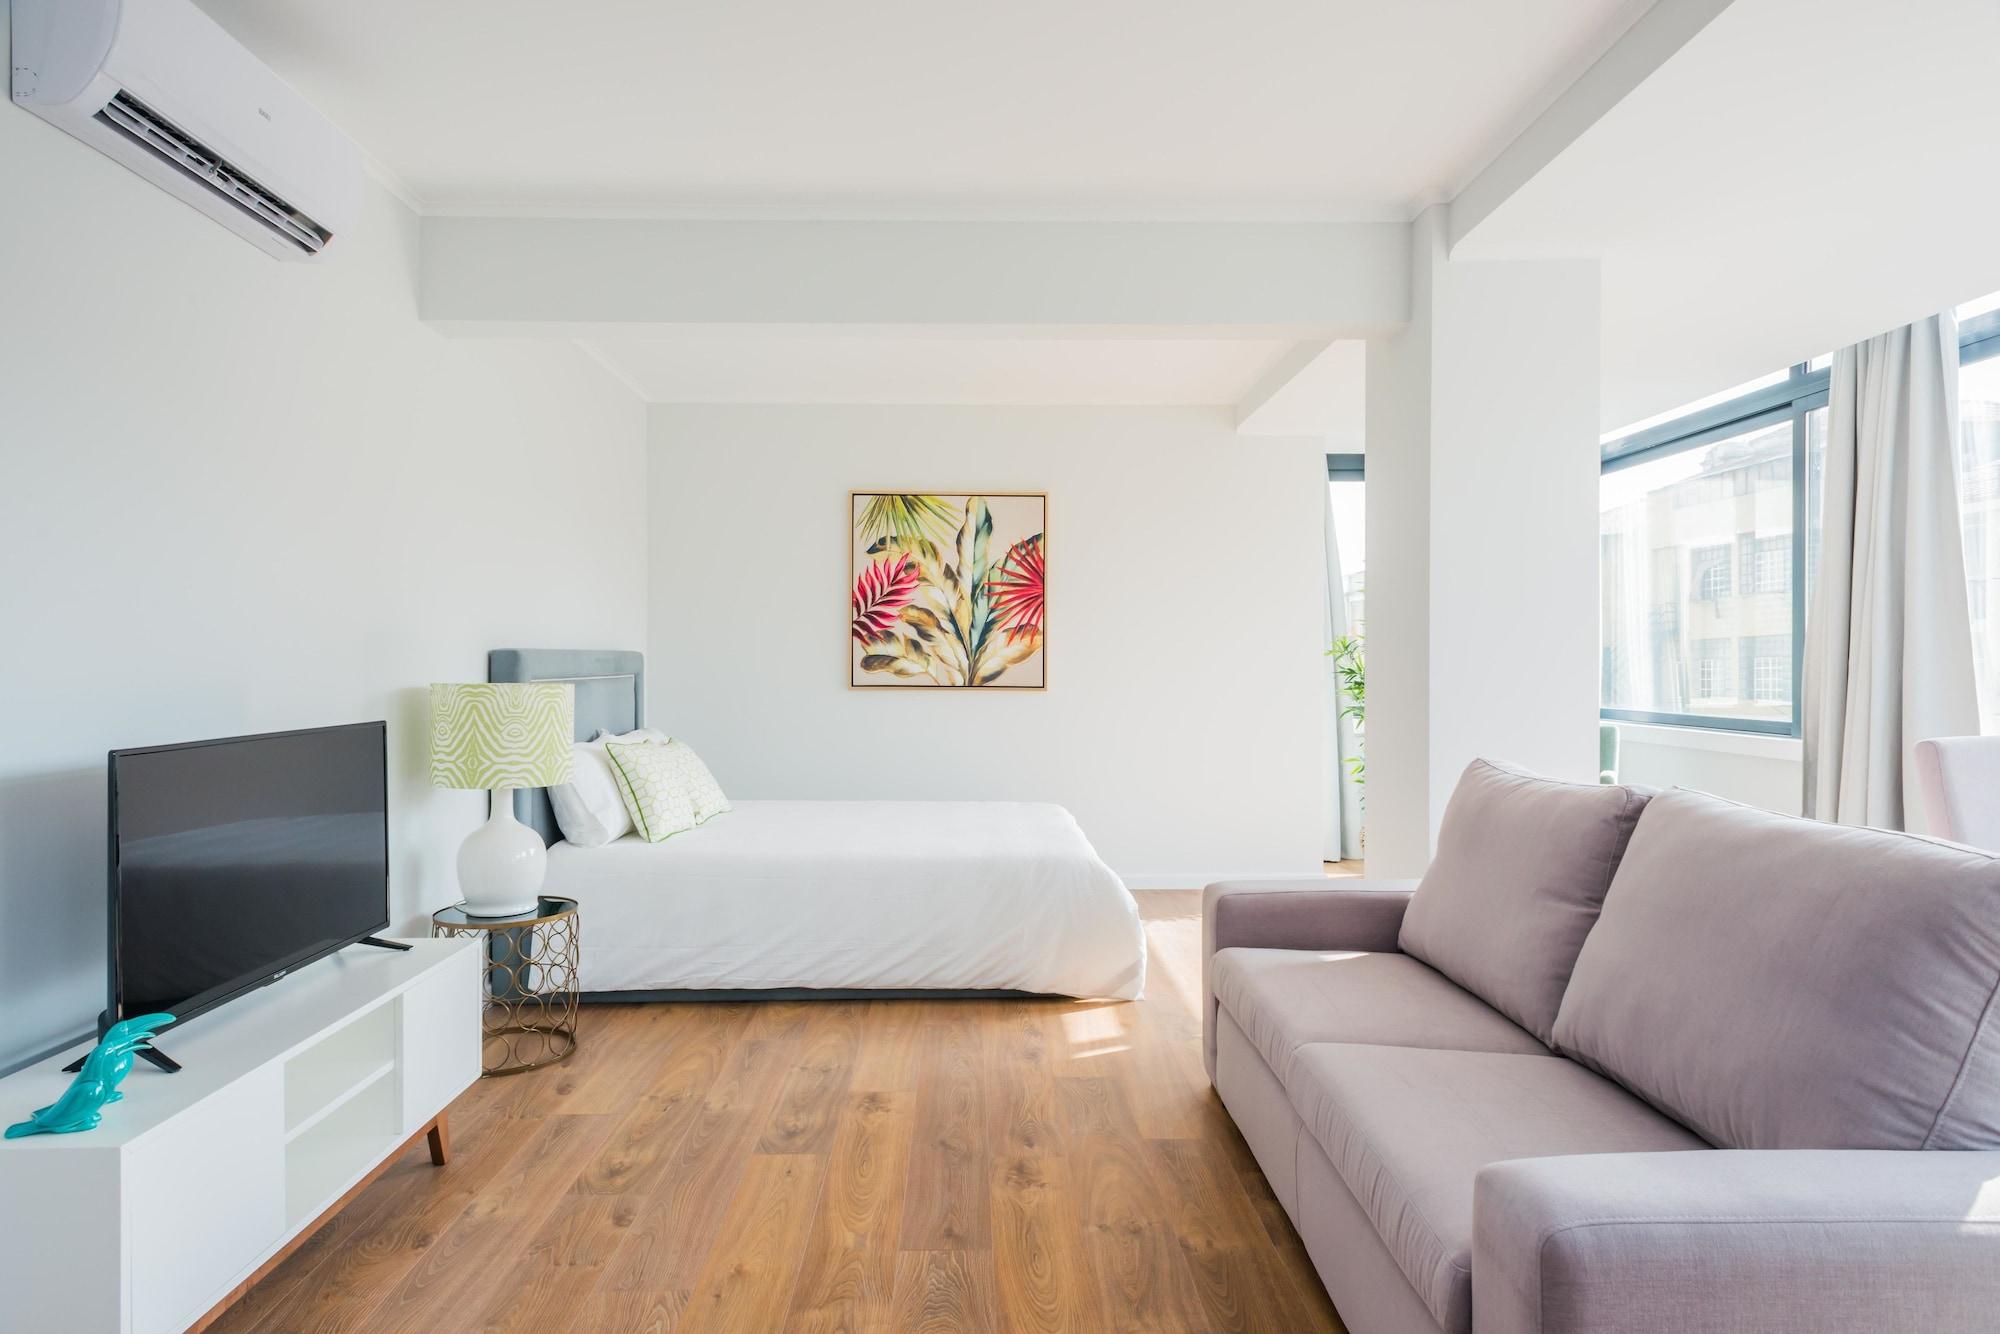 137 Lux Residence, Lisboa